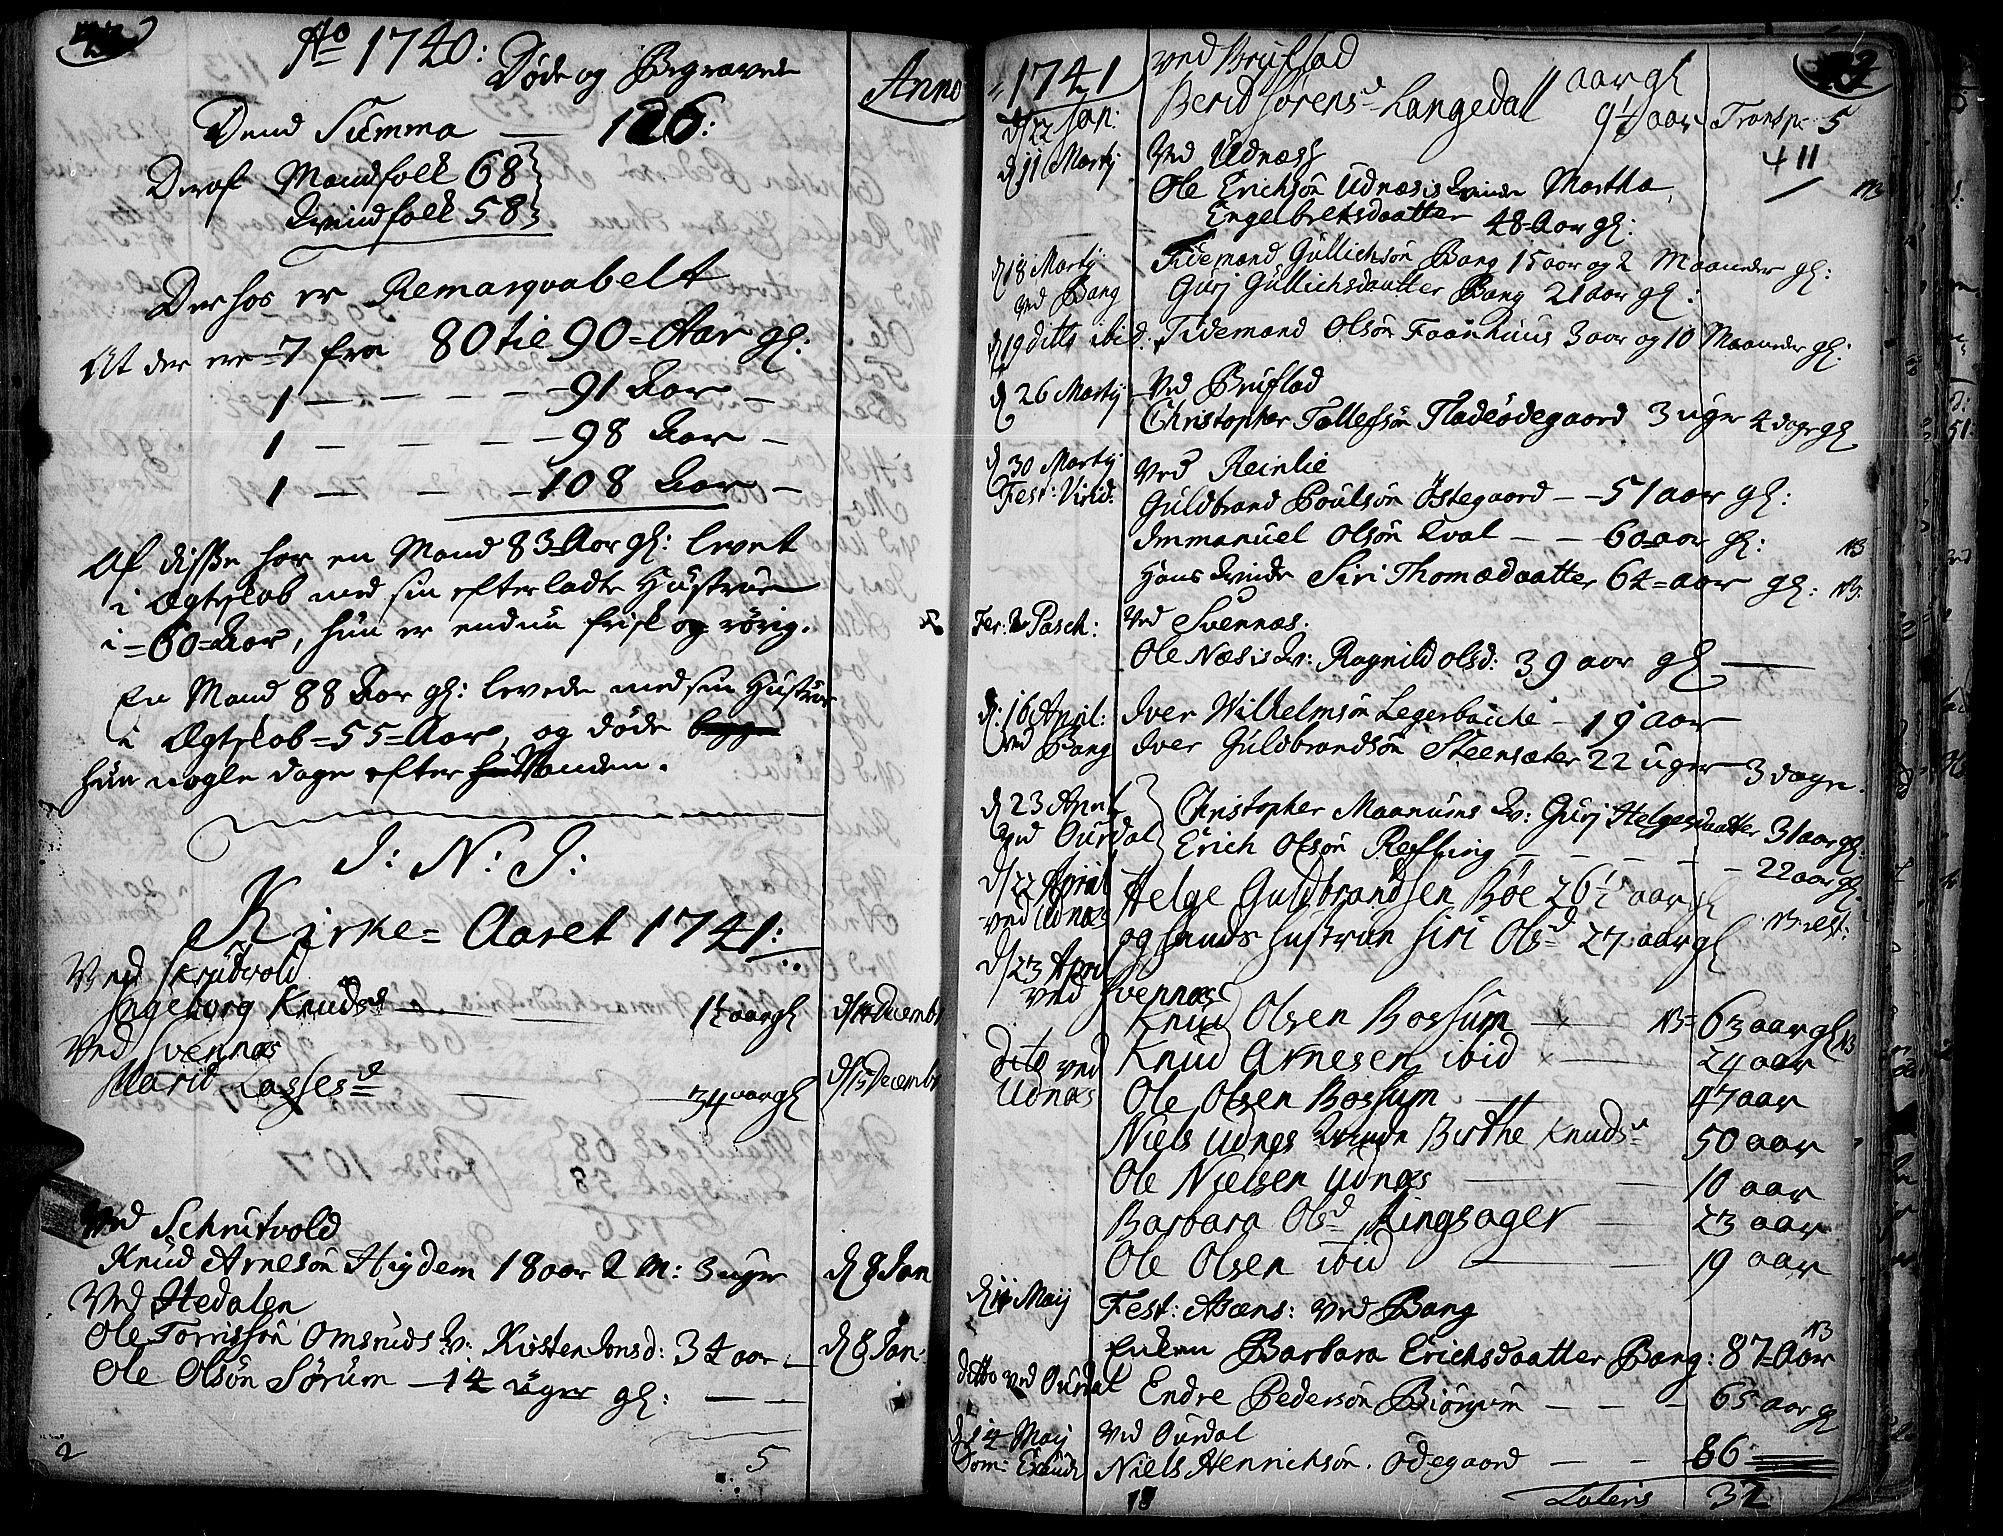 SAH, Aurdal prestekontor, Ministerialbok nr. 4, 1730-1762, s. 42-43